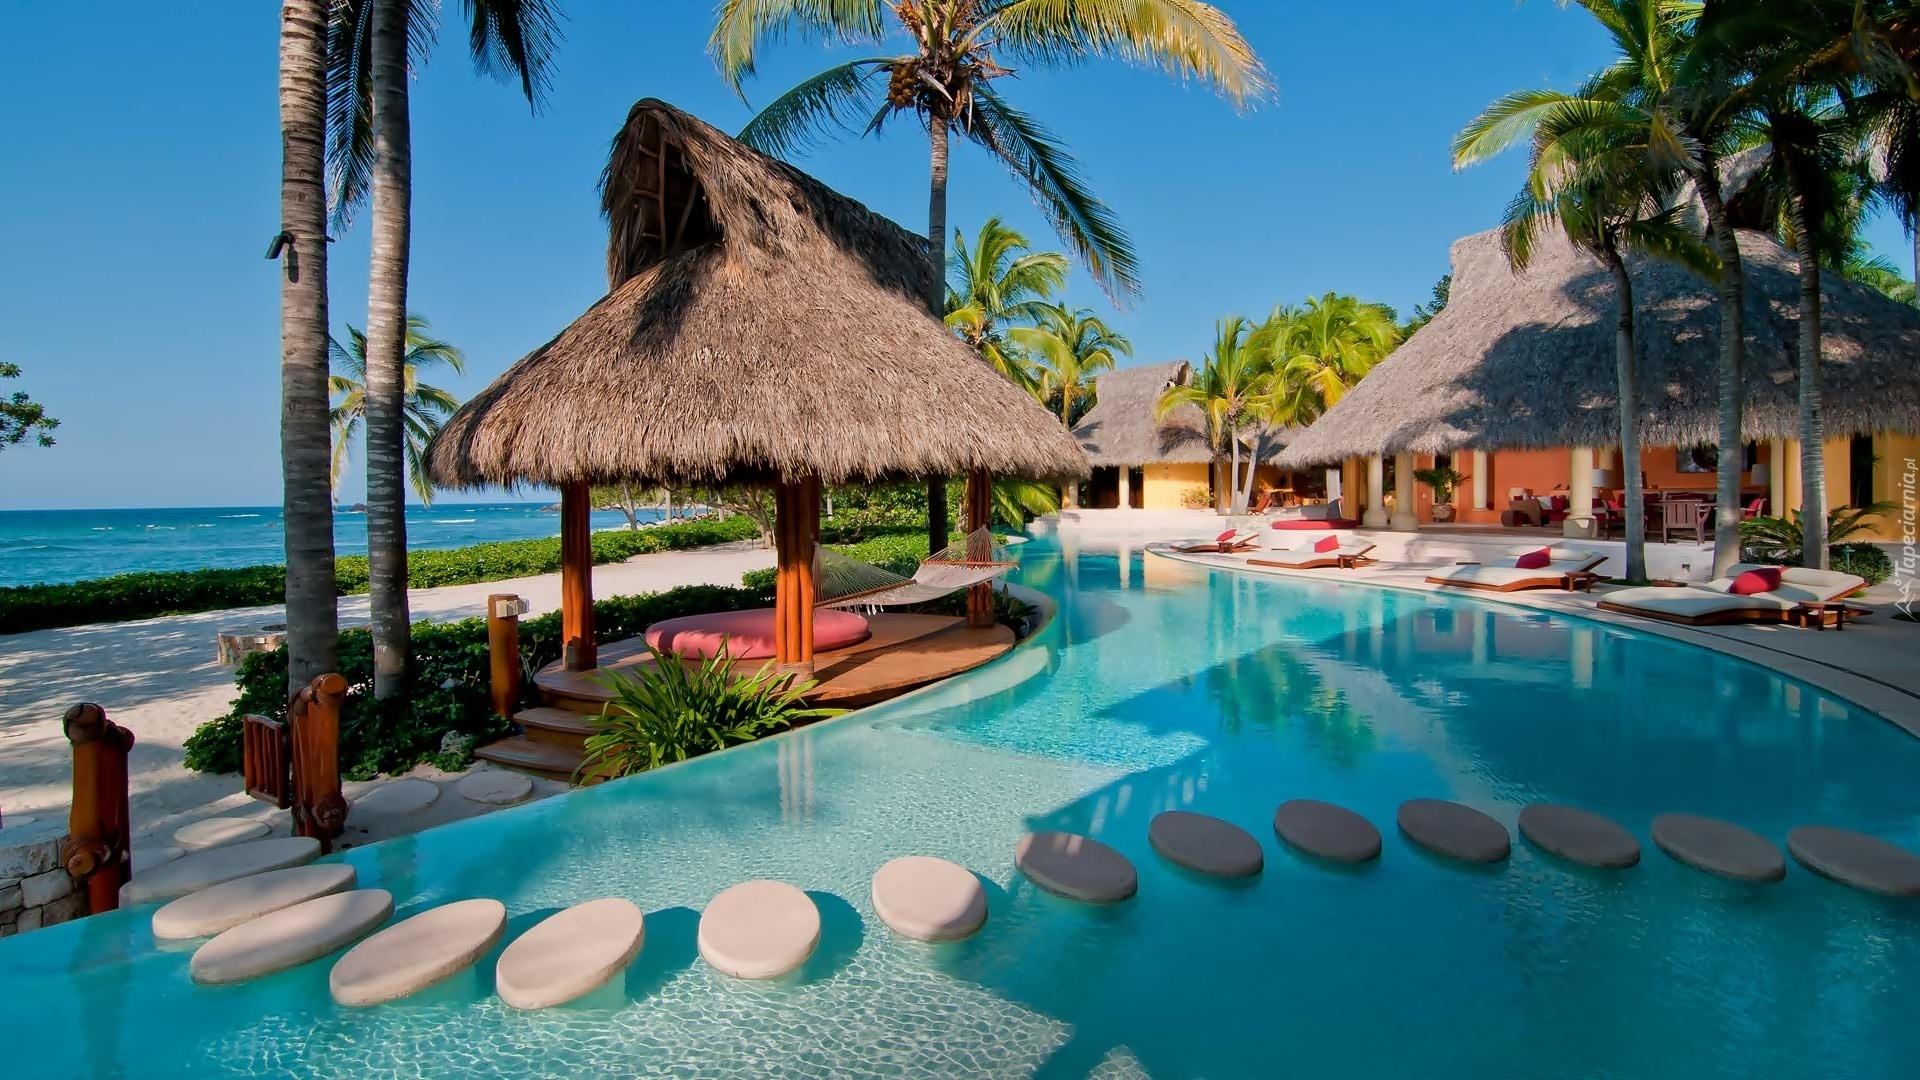 Basen palmy domy hotel ocean tropiki for Imagenes de jardines exoticos